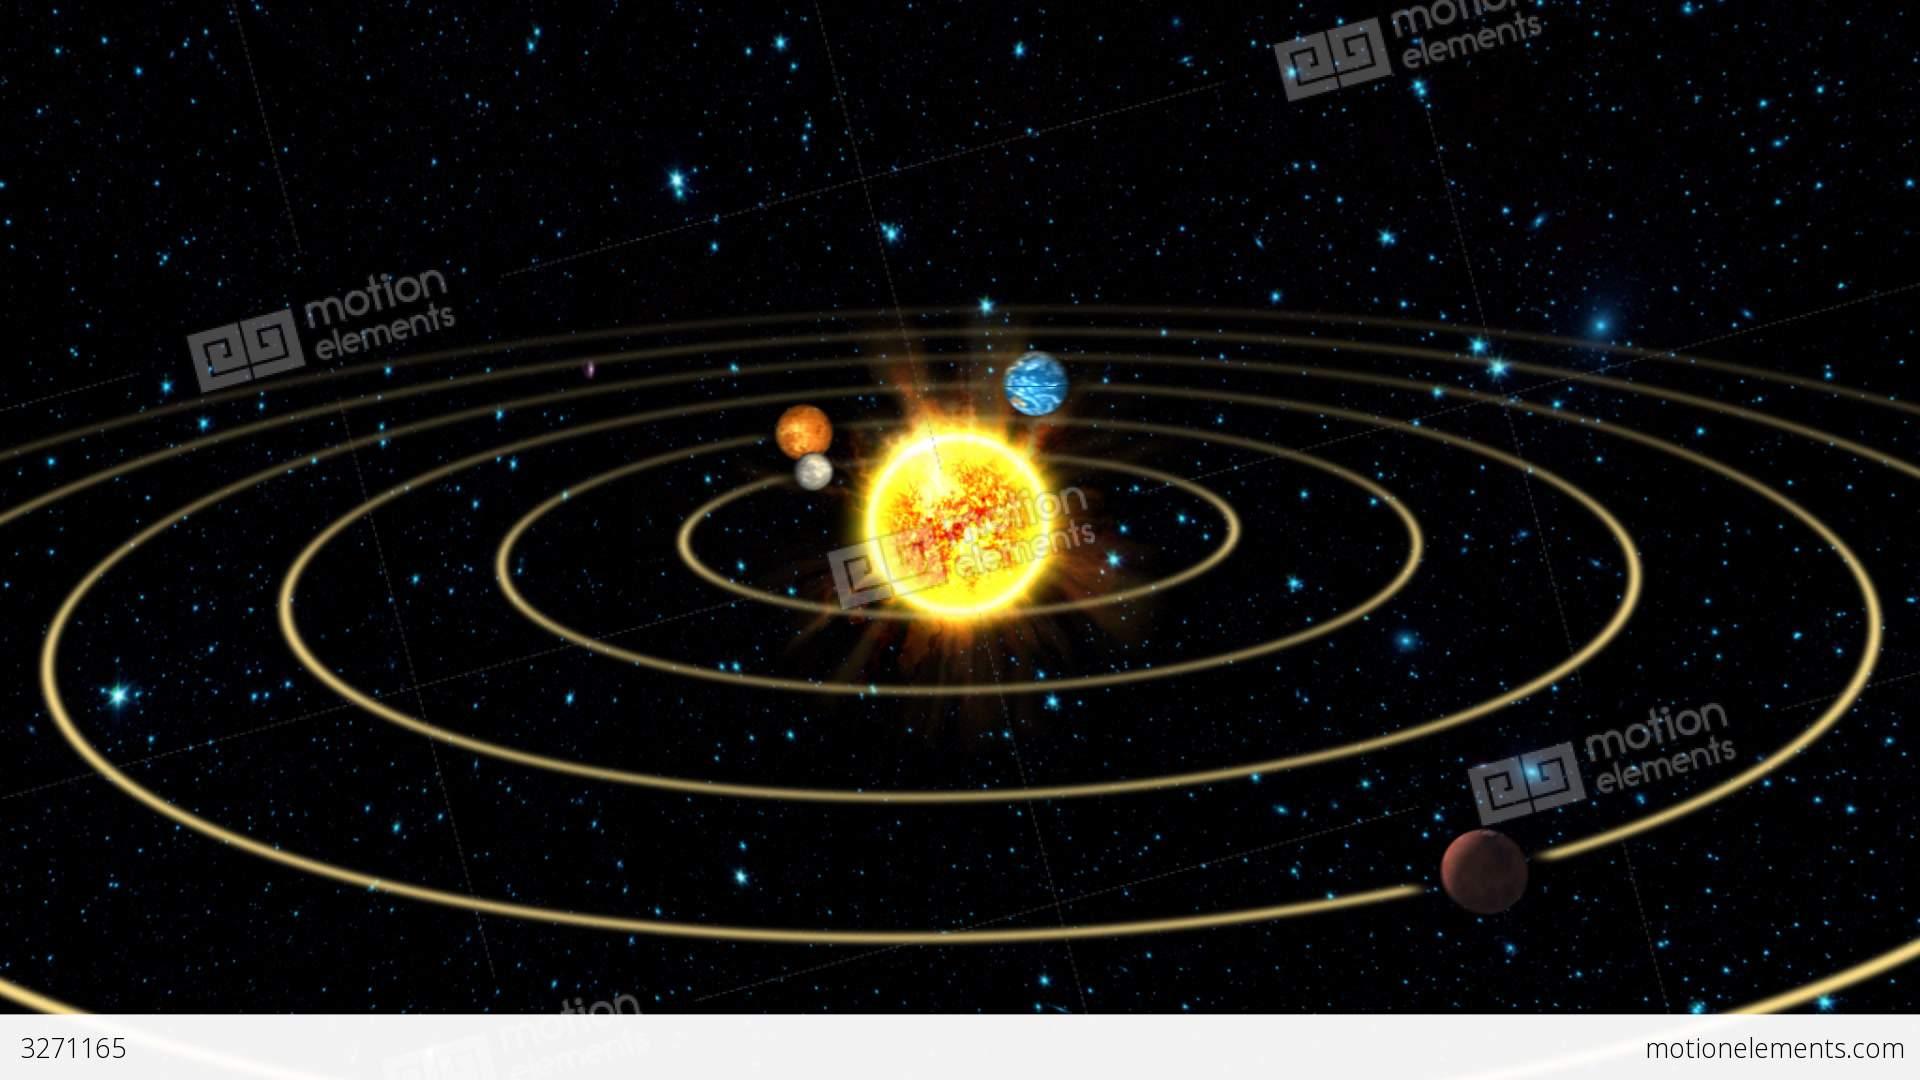 solar system animated - photo #18